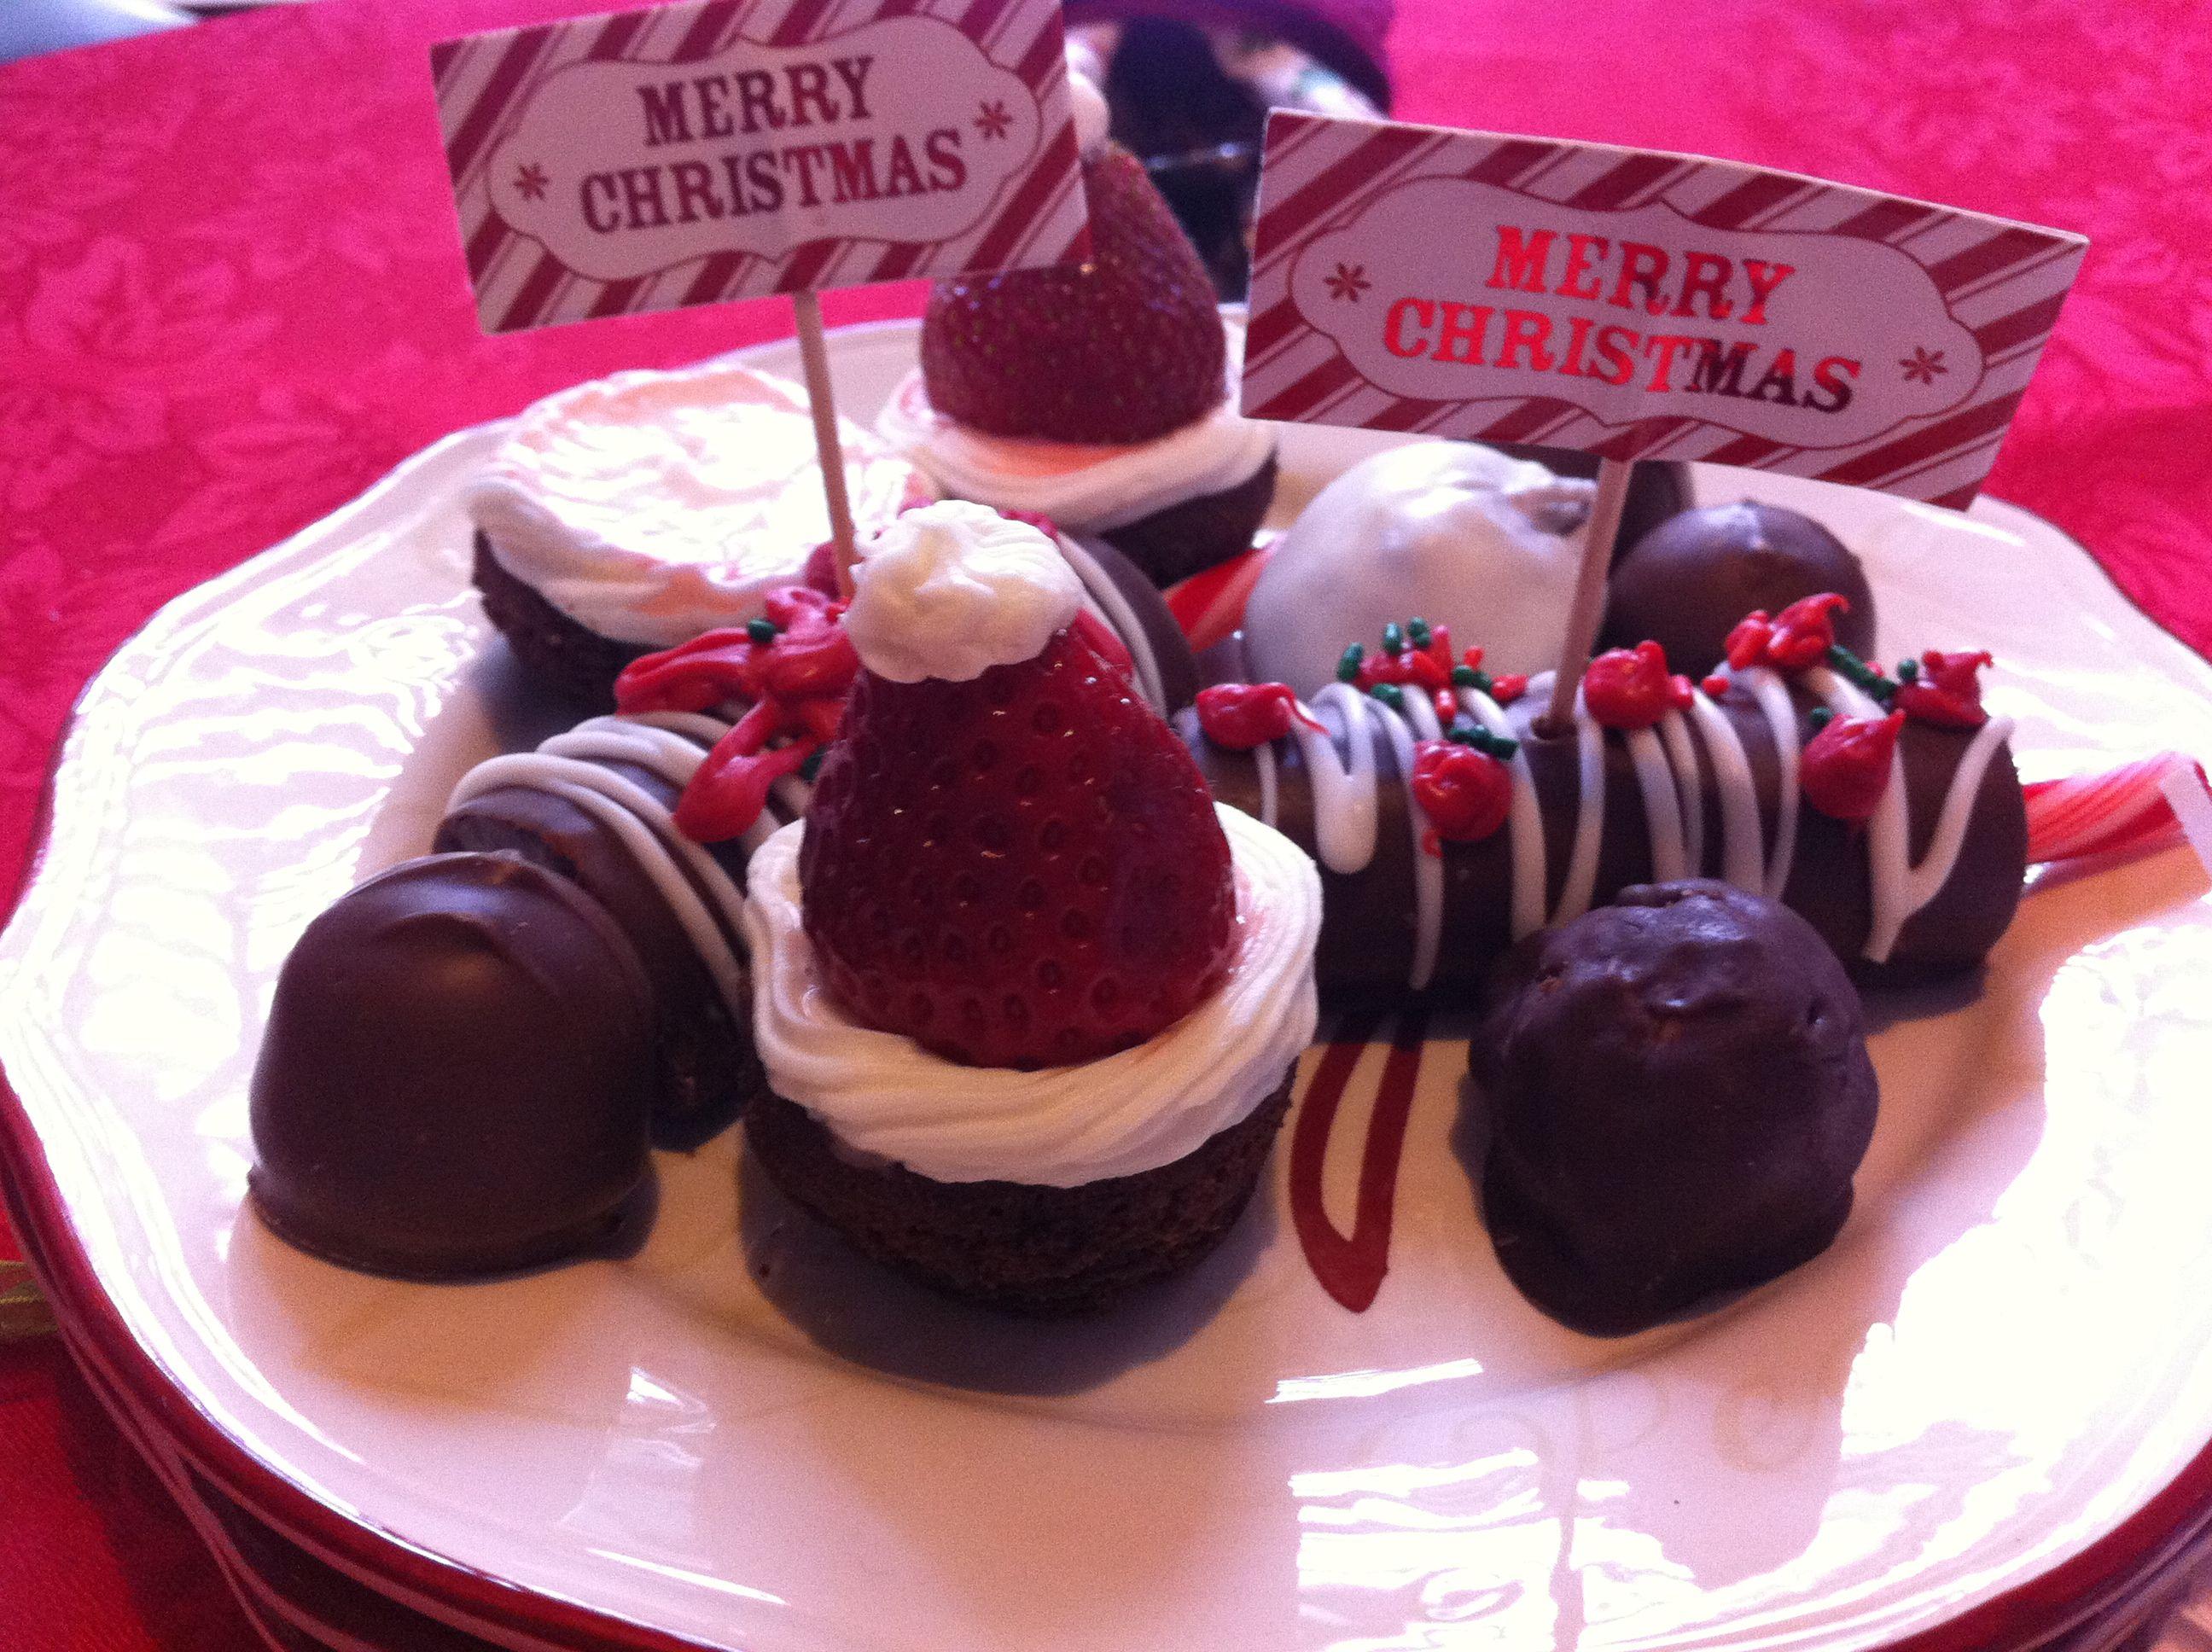 Santa Brownie hats, decorated swiss rolls, chocolate covered cherries, pb balls 2011 Christmas dinner treats